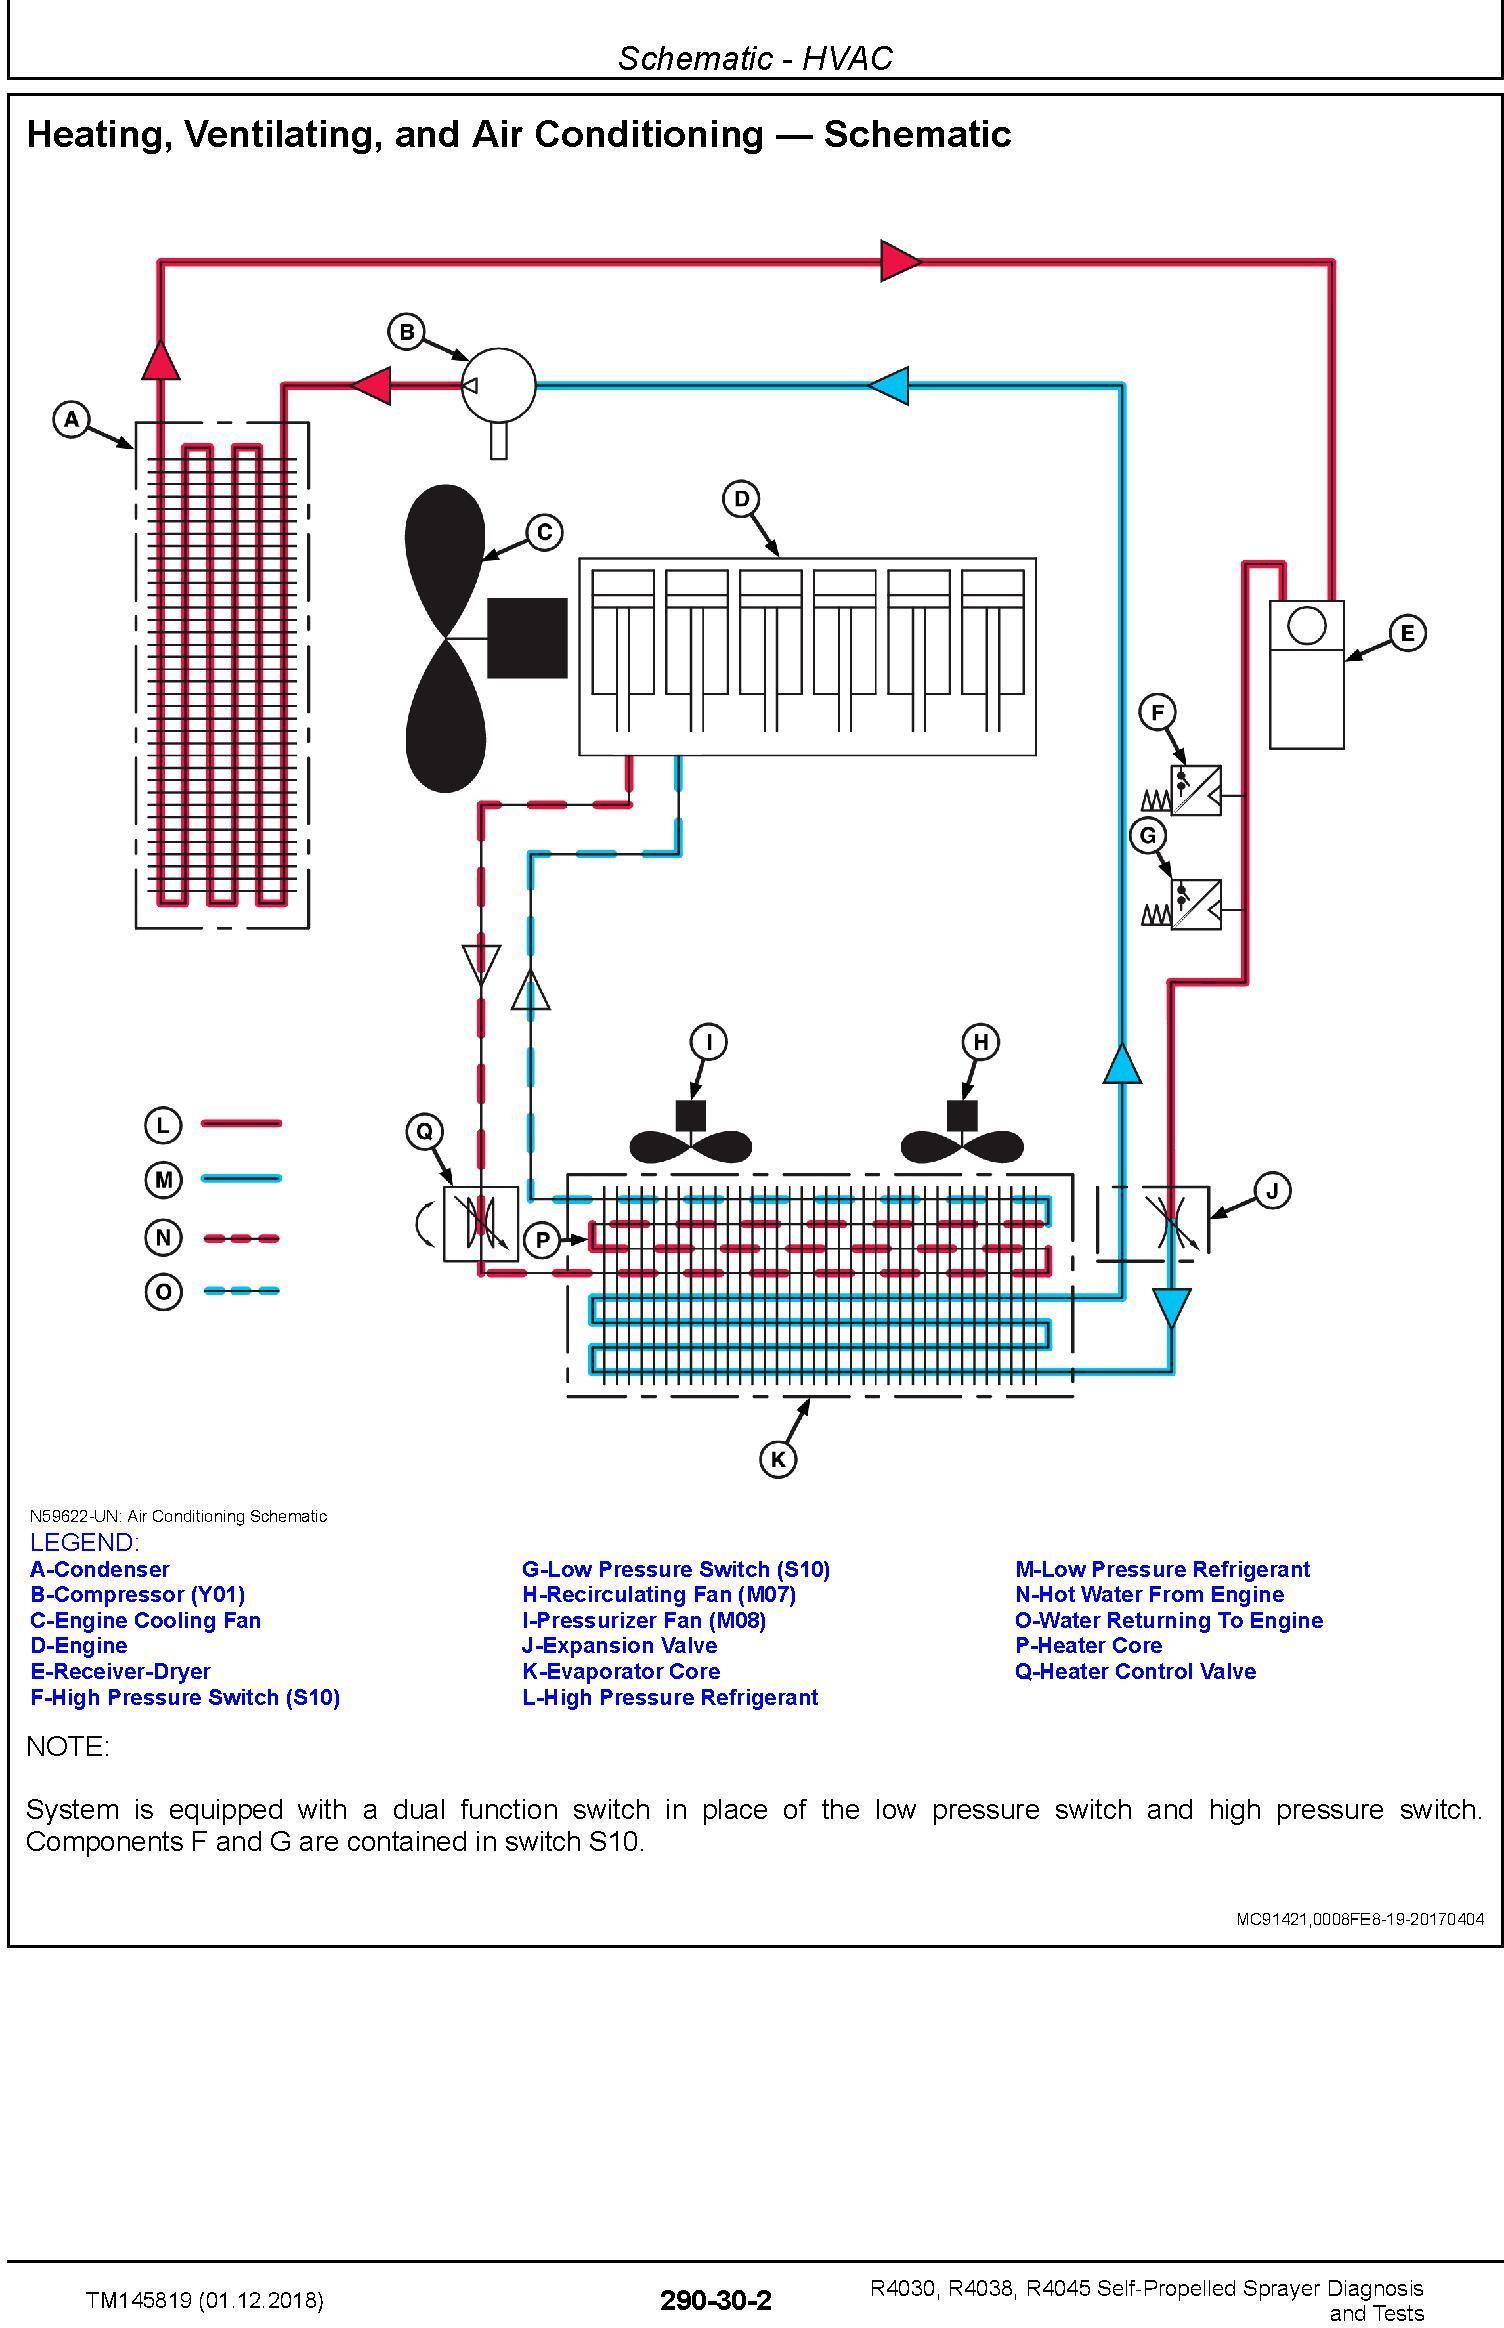 John Deere R4030, R4038, R4045 Self-Propelled Sprayer (SN.180001-) Diagnostic Manual (TM145819) - 2